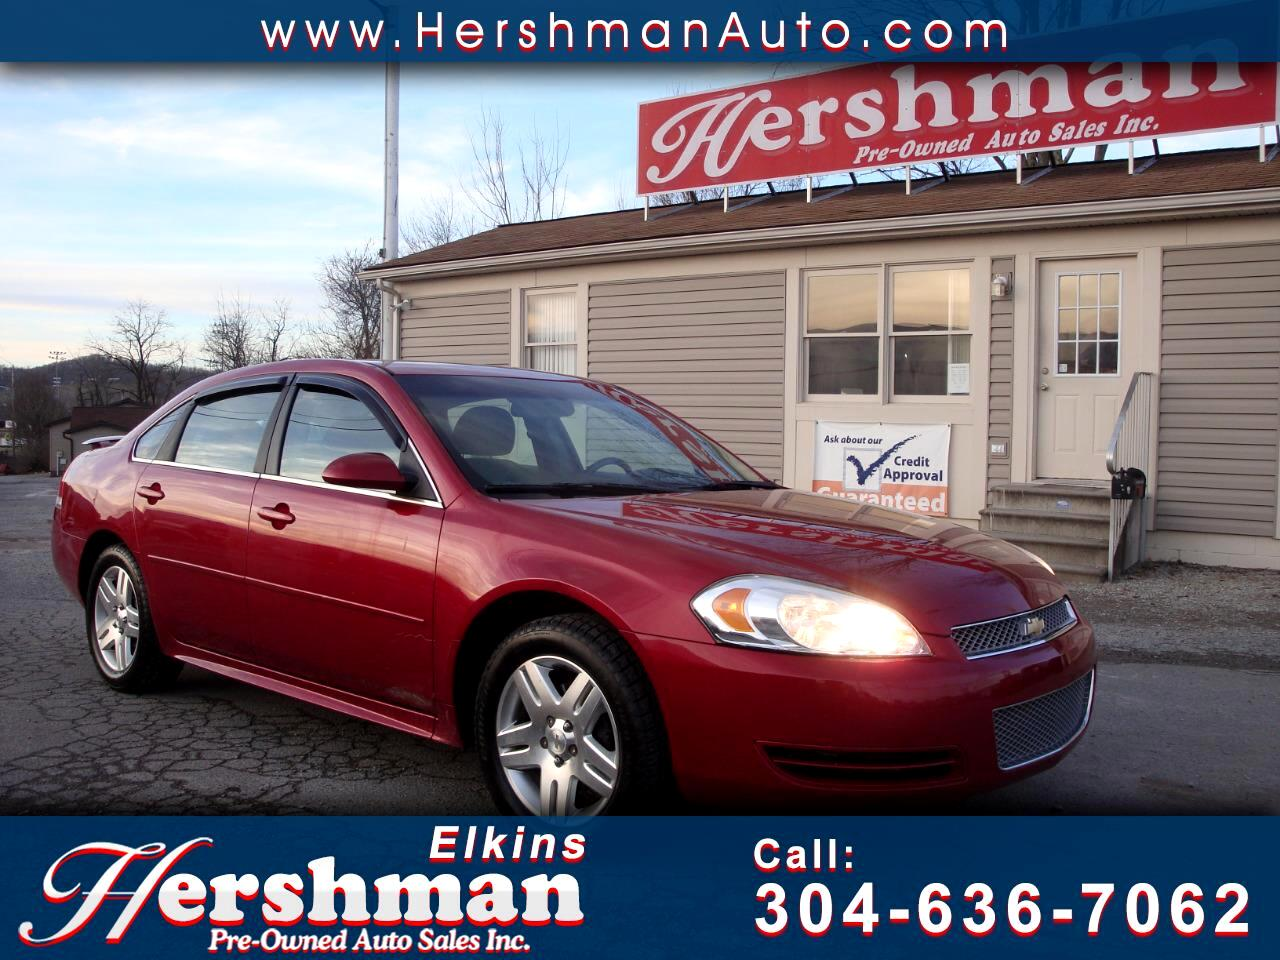 2013 Chevrolet Impala 1LT